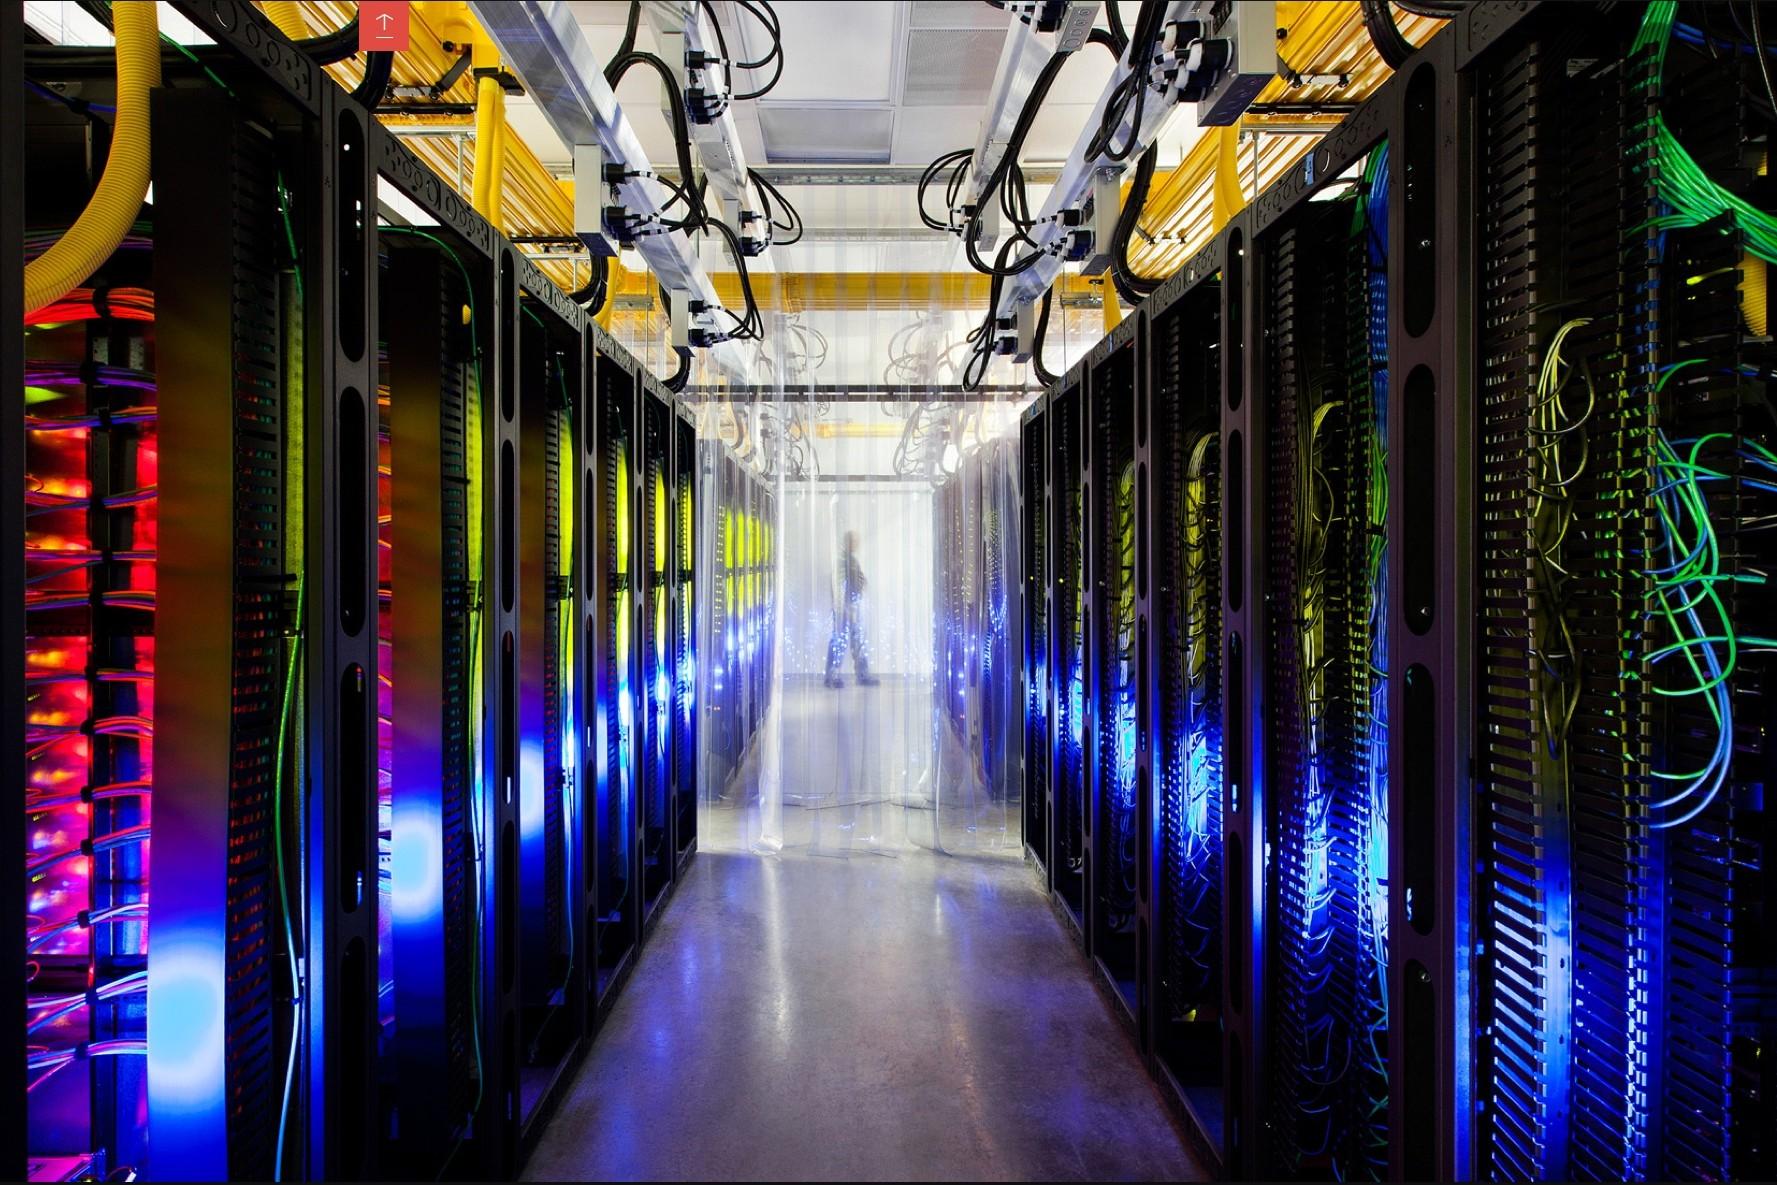 Inside a Google data center. Image courtesy of Google